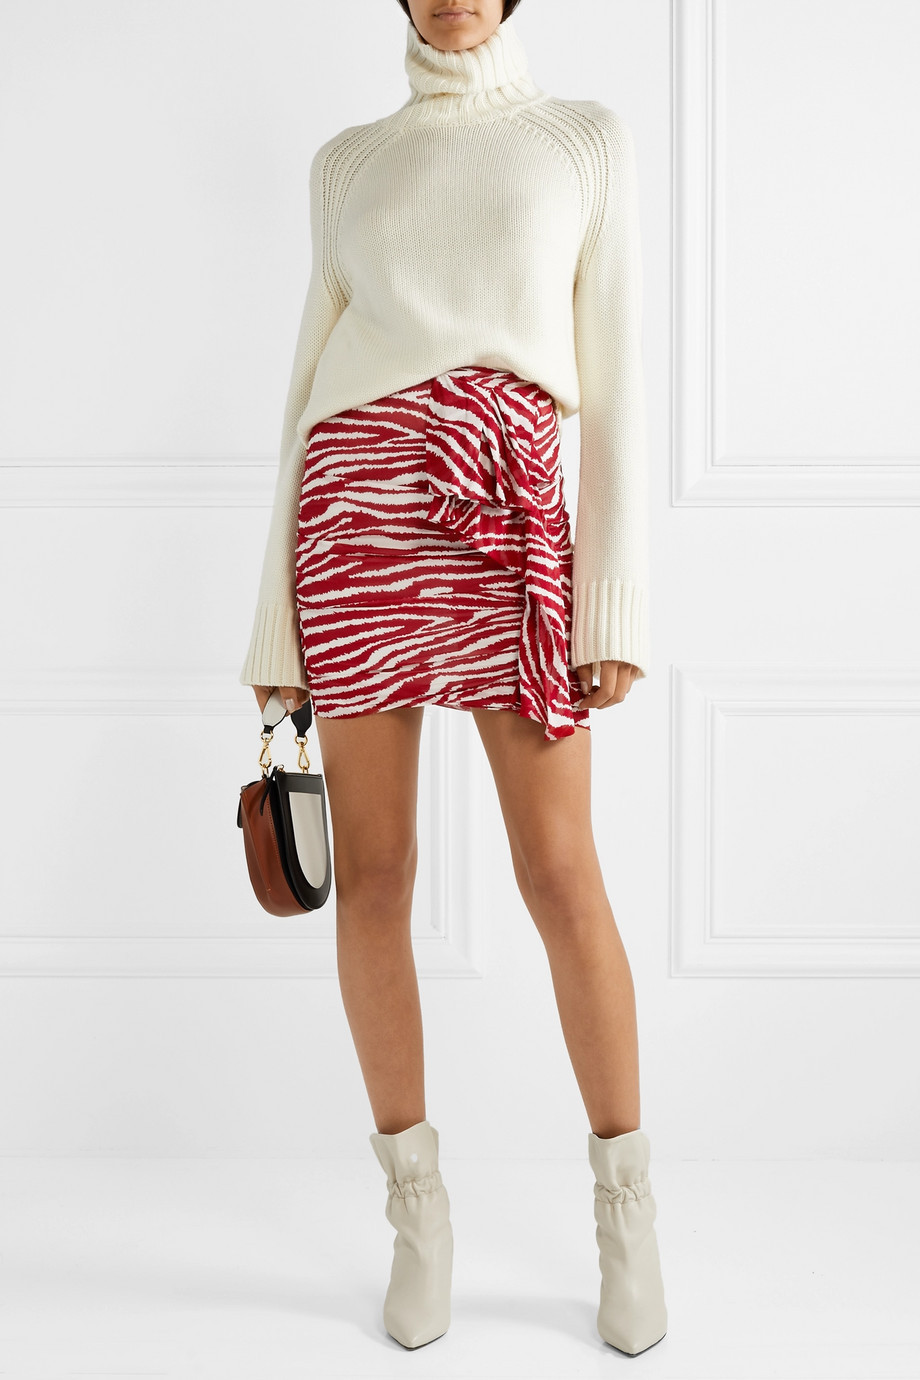 Isabel Marant Jerine ruffled zebra-print chiffon mini skirt $345